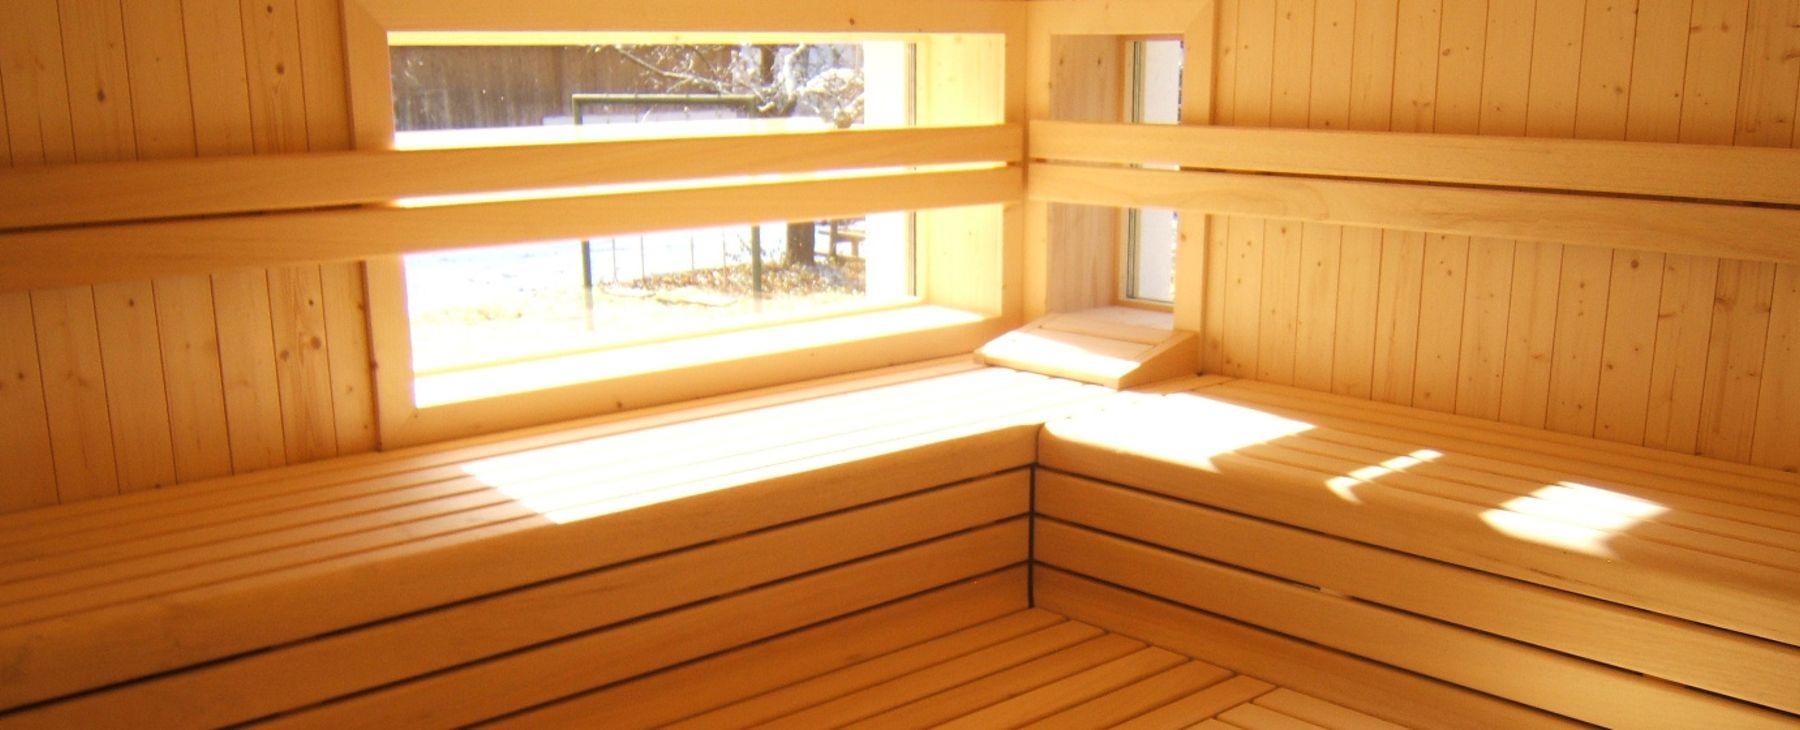 sauna schaller biosauna aus s dtirol. Black Bedroom Furniture Sets. Home Design Ideas